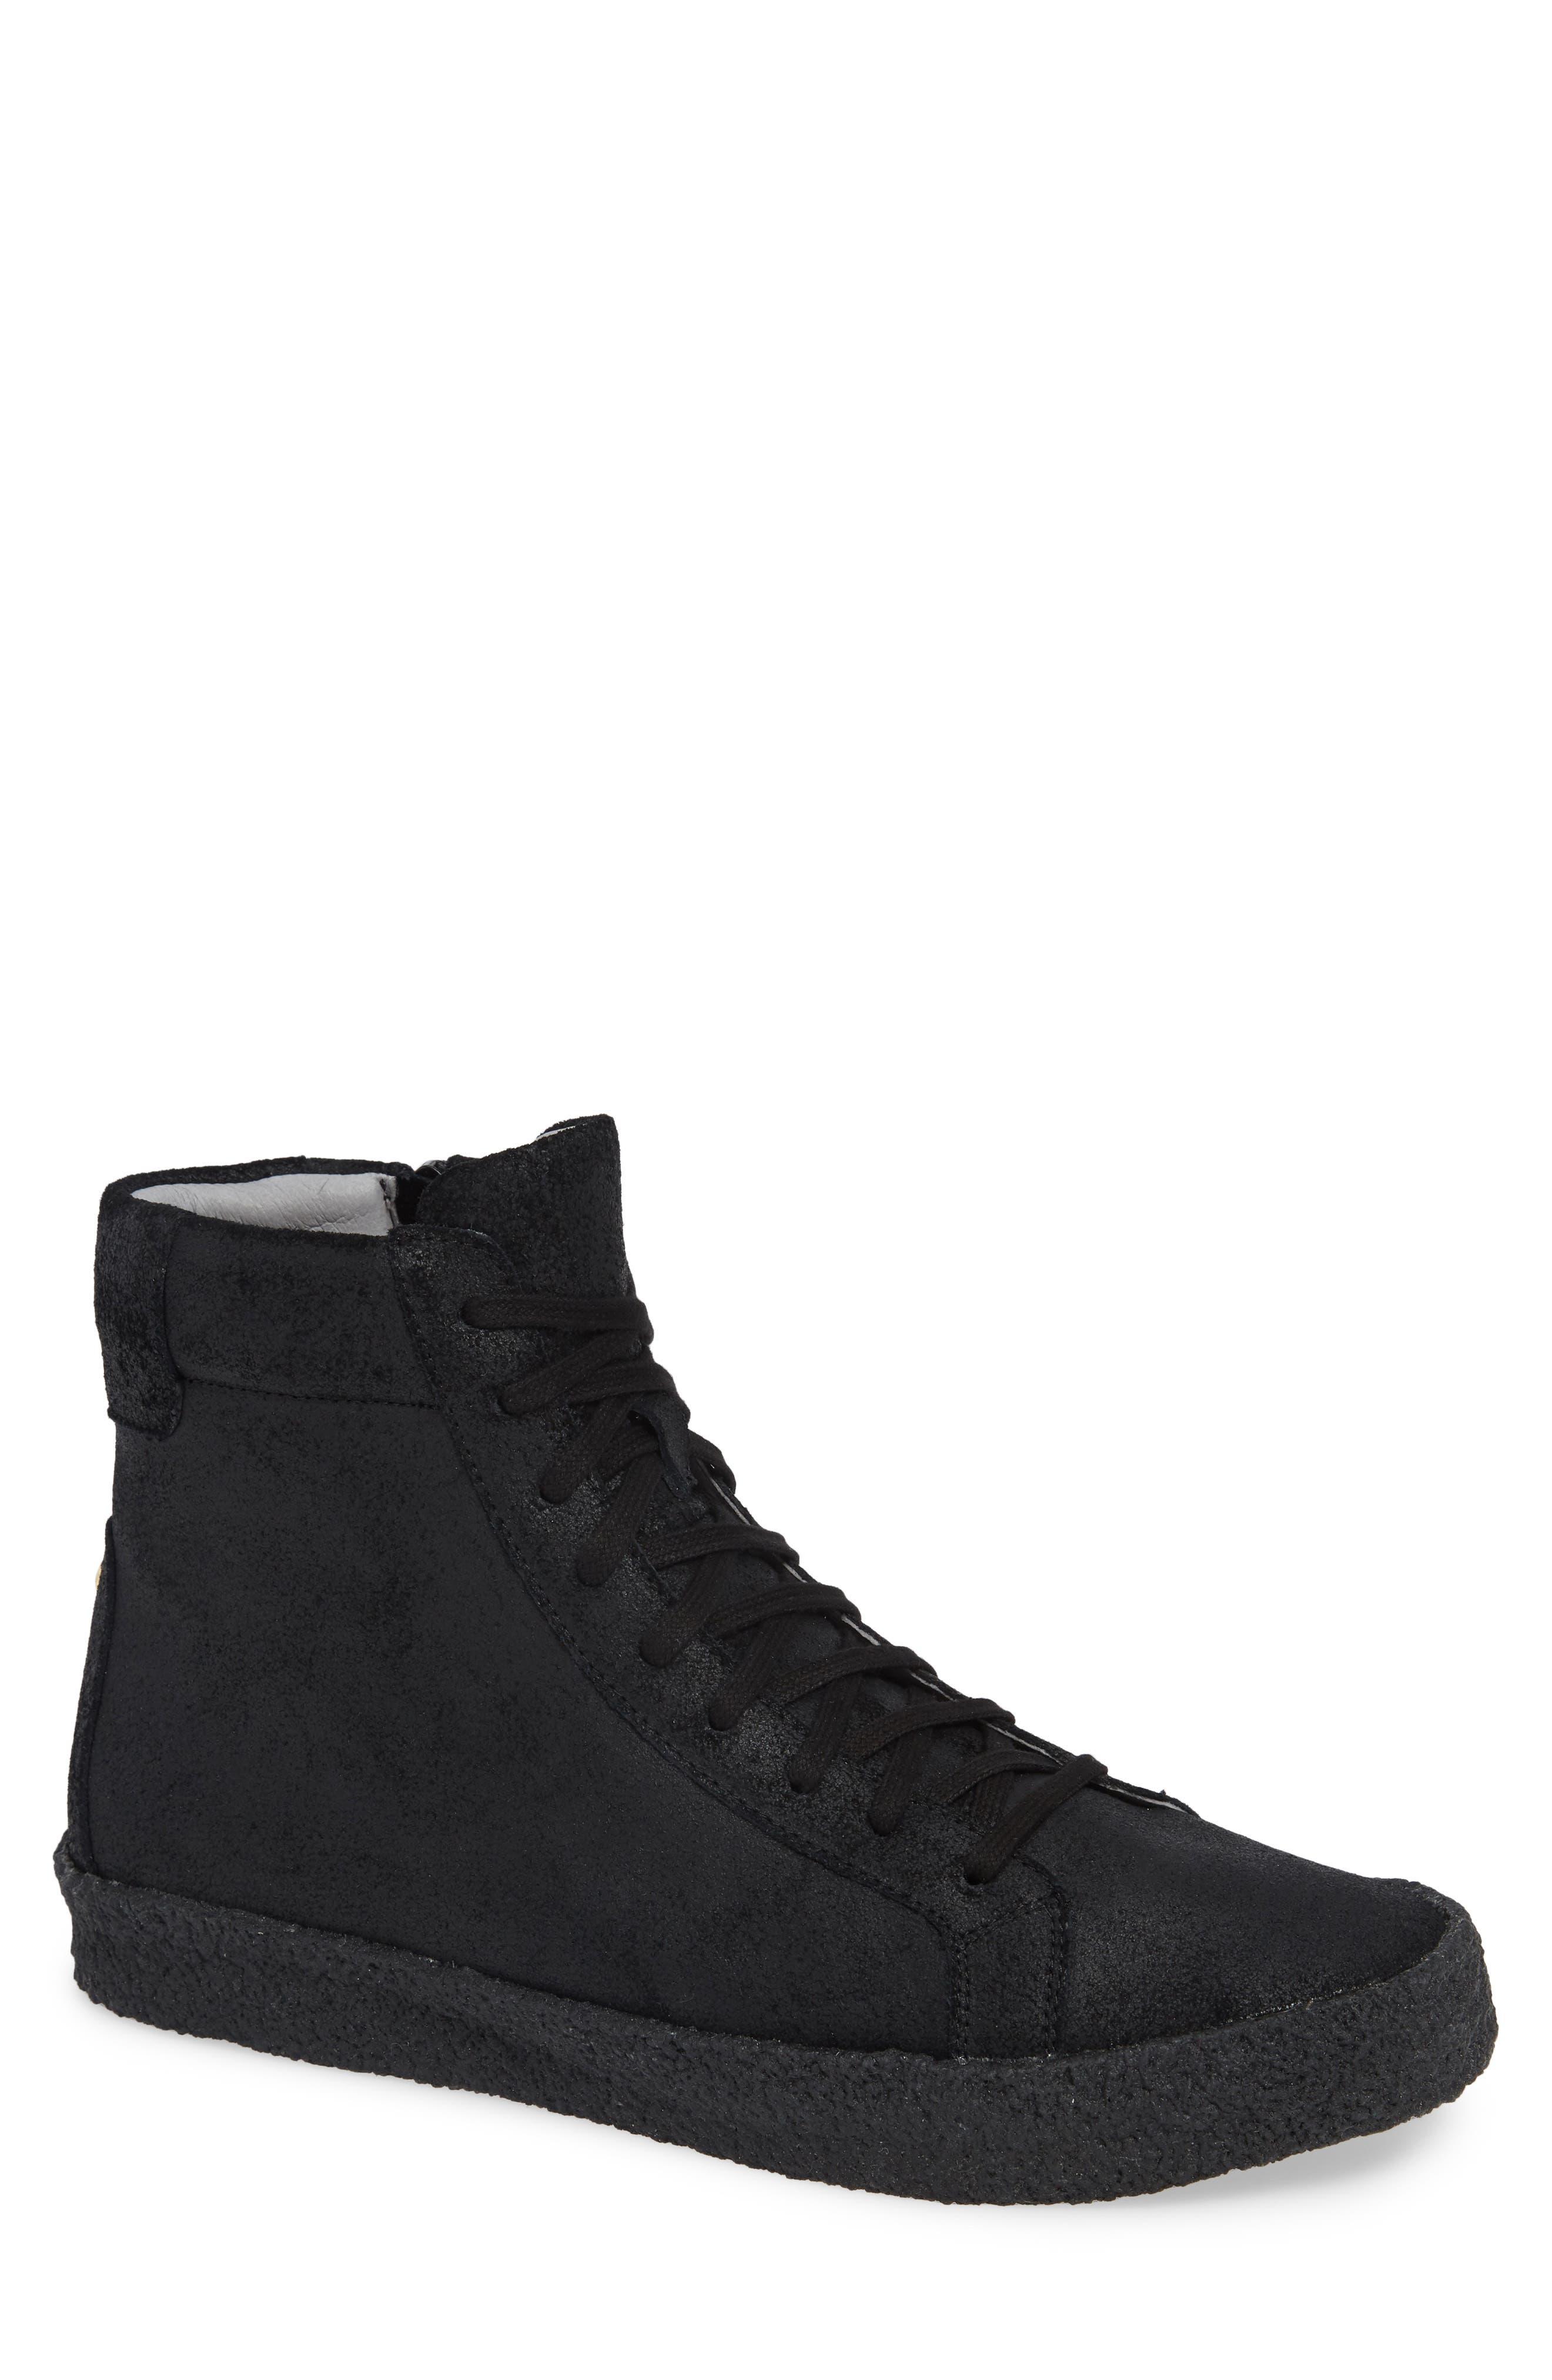 Apa High Top Sneaker,                             Main thumbnail 1, color,                             TRIPLE BLACK LEATHER